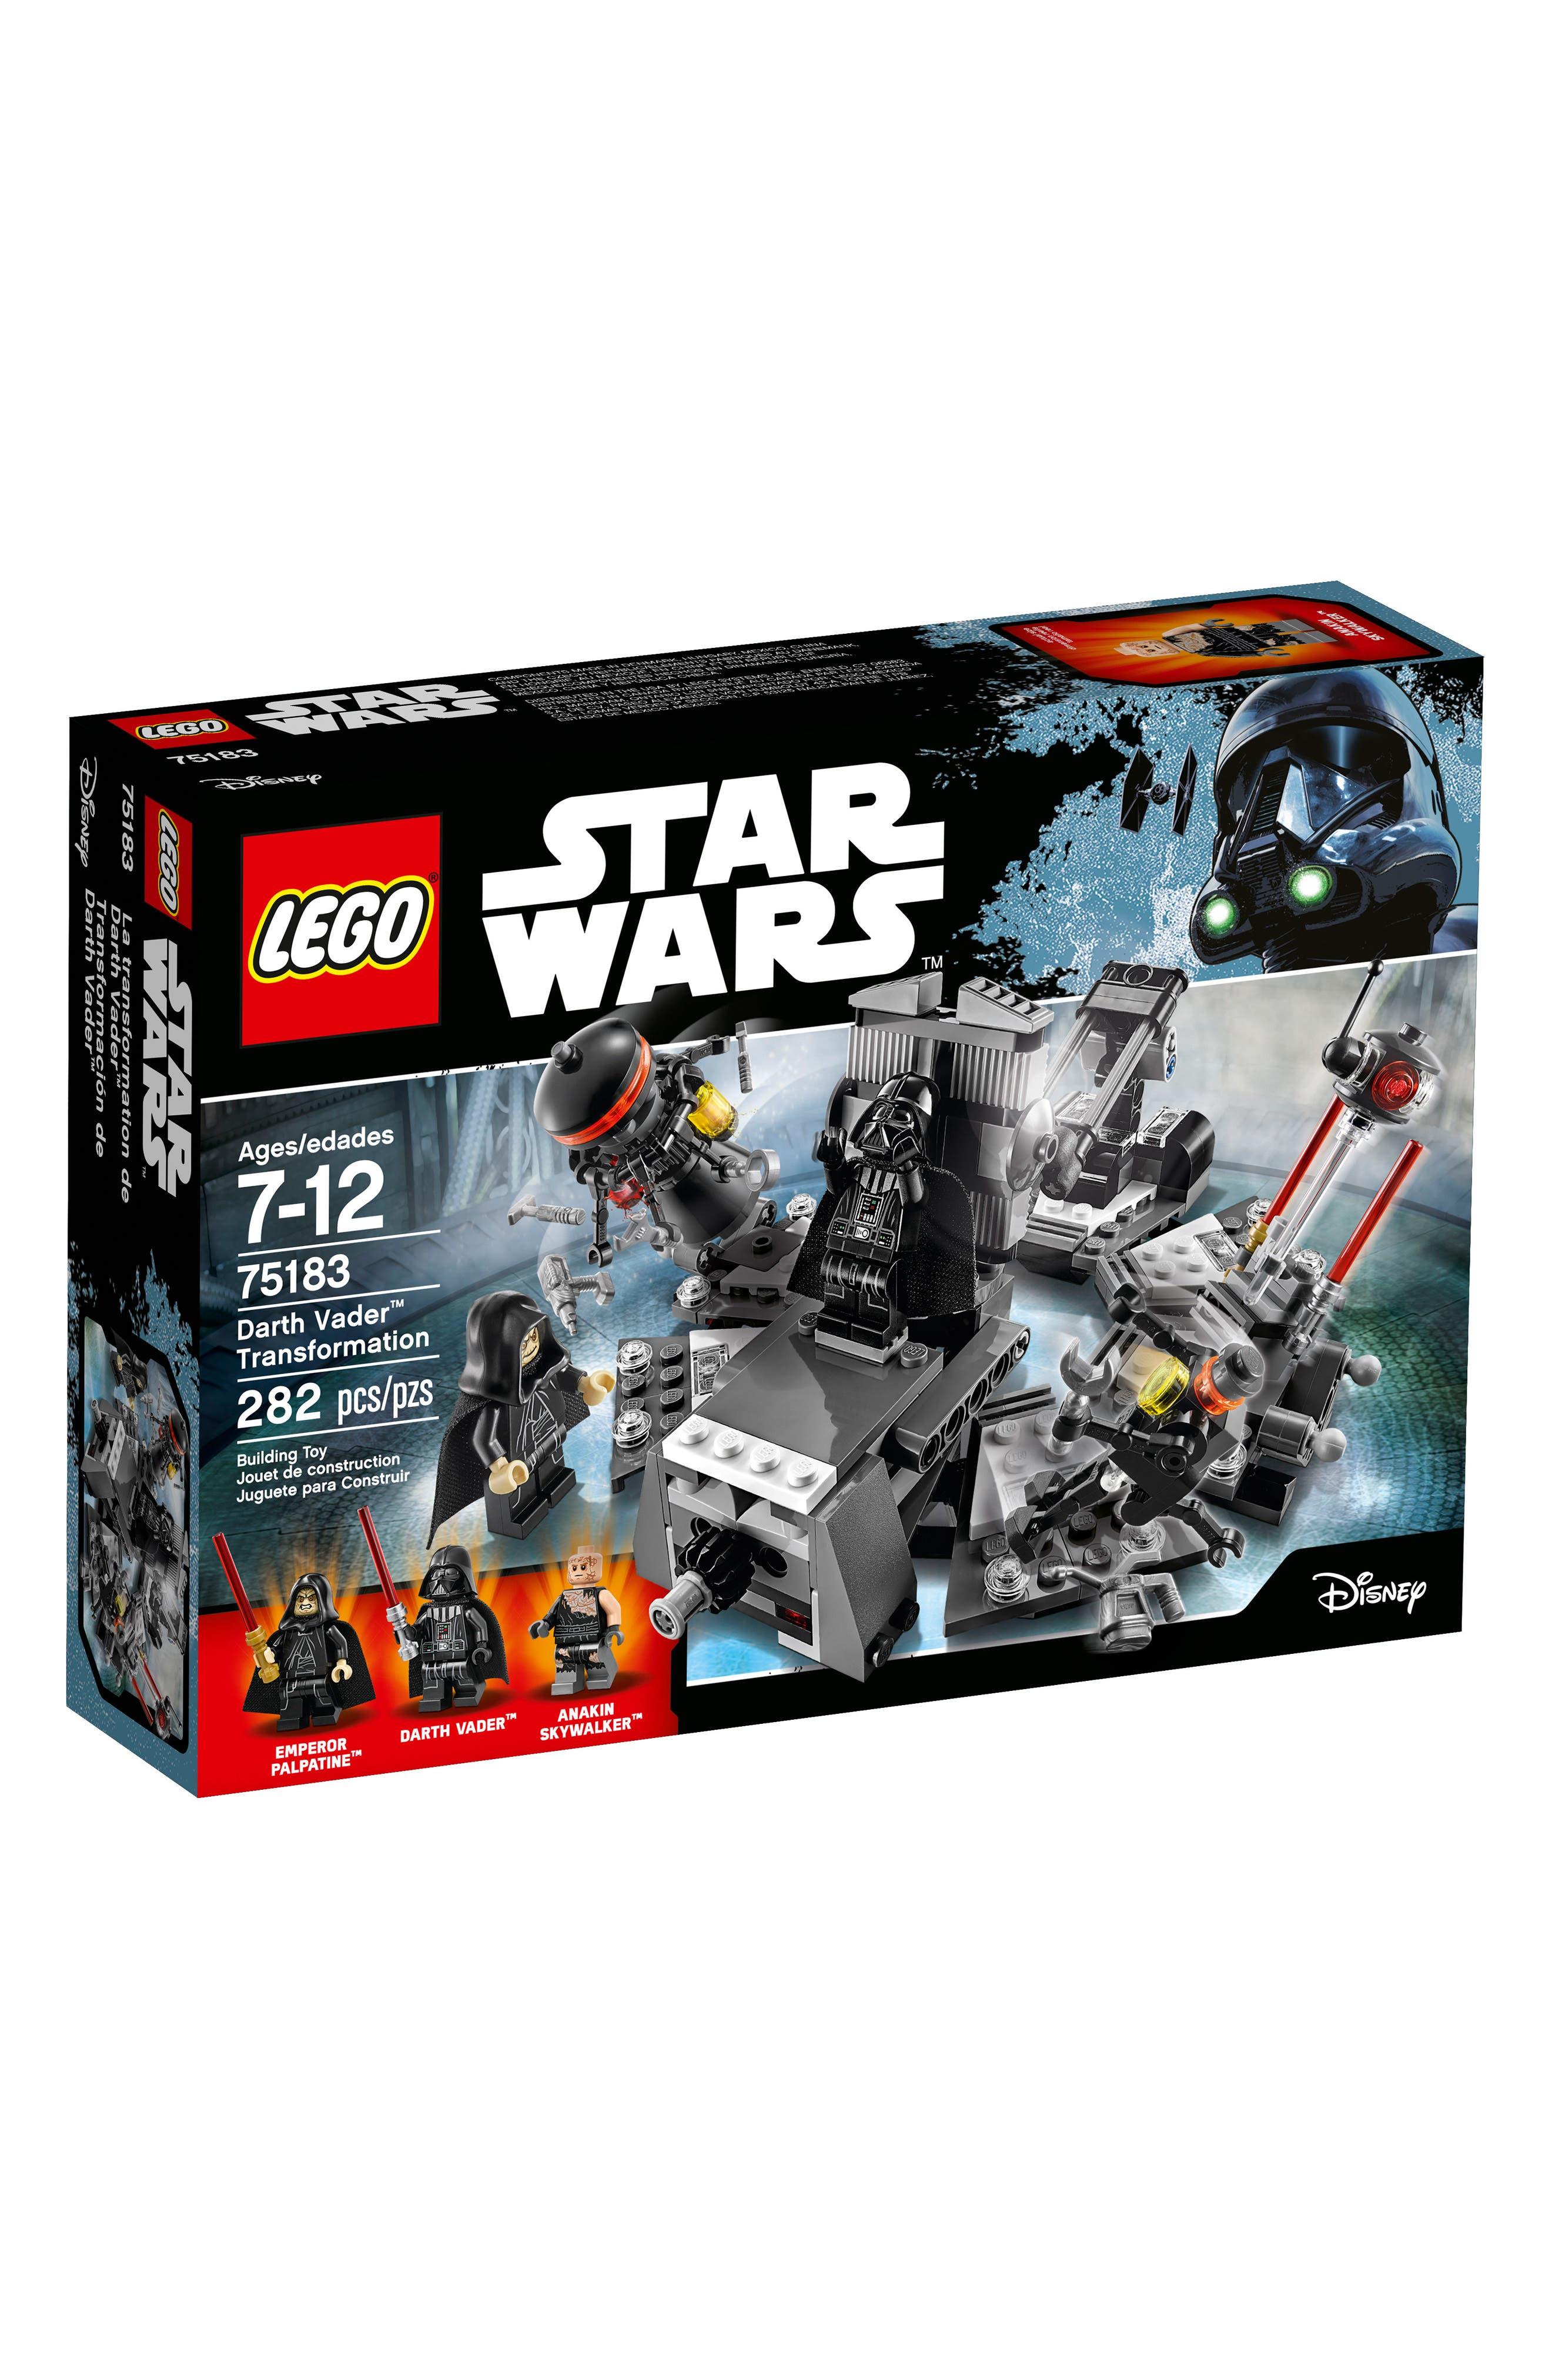 Alternate Image 1 Selected - LEGO® Star Wars™ Revenge of the Sith Darth Vader Transformation - 75183